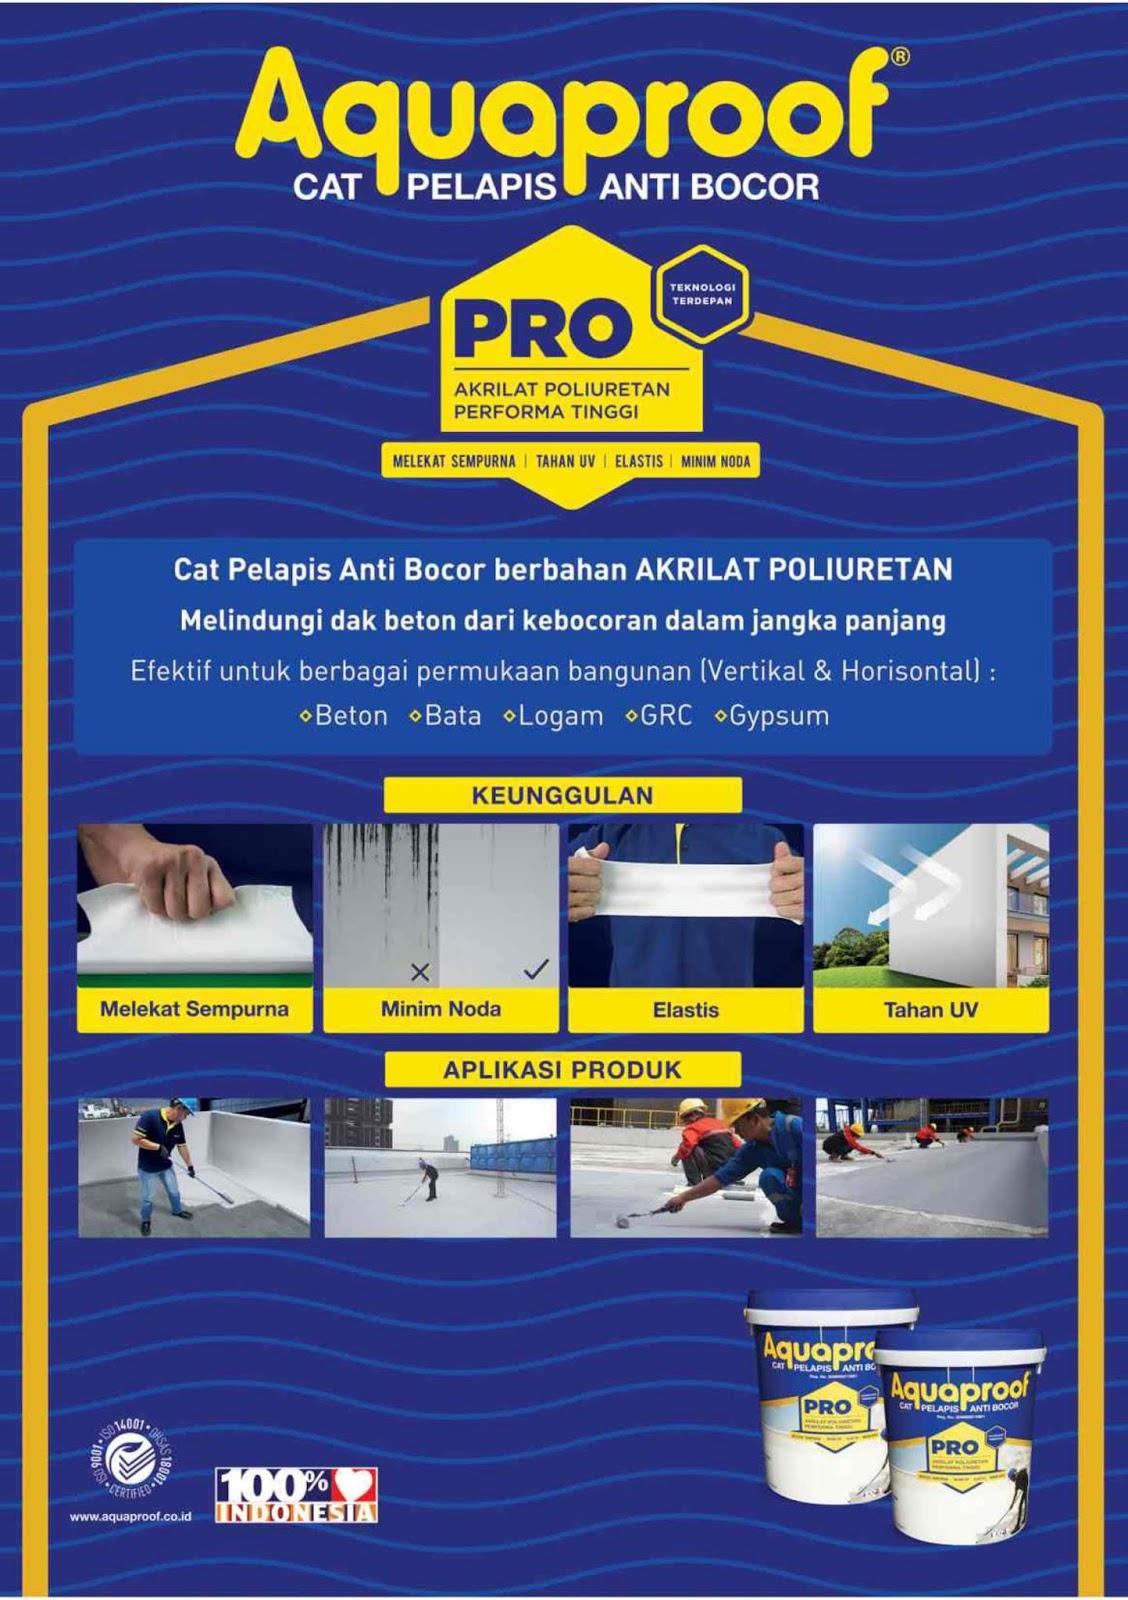 #DepoBangunan - #Promo #Katalog Periode 01 - 10 Februari 2019